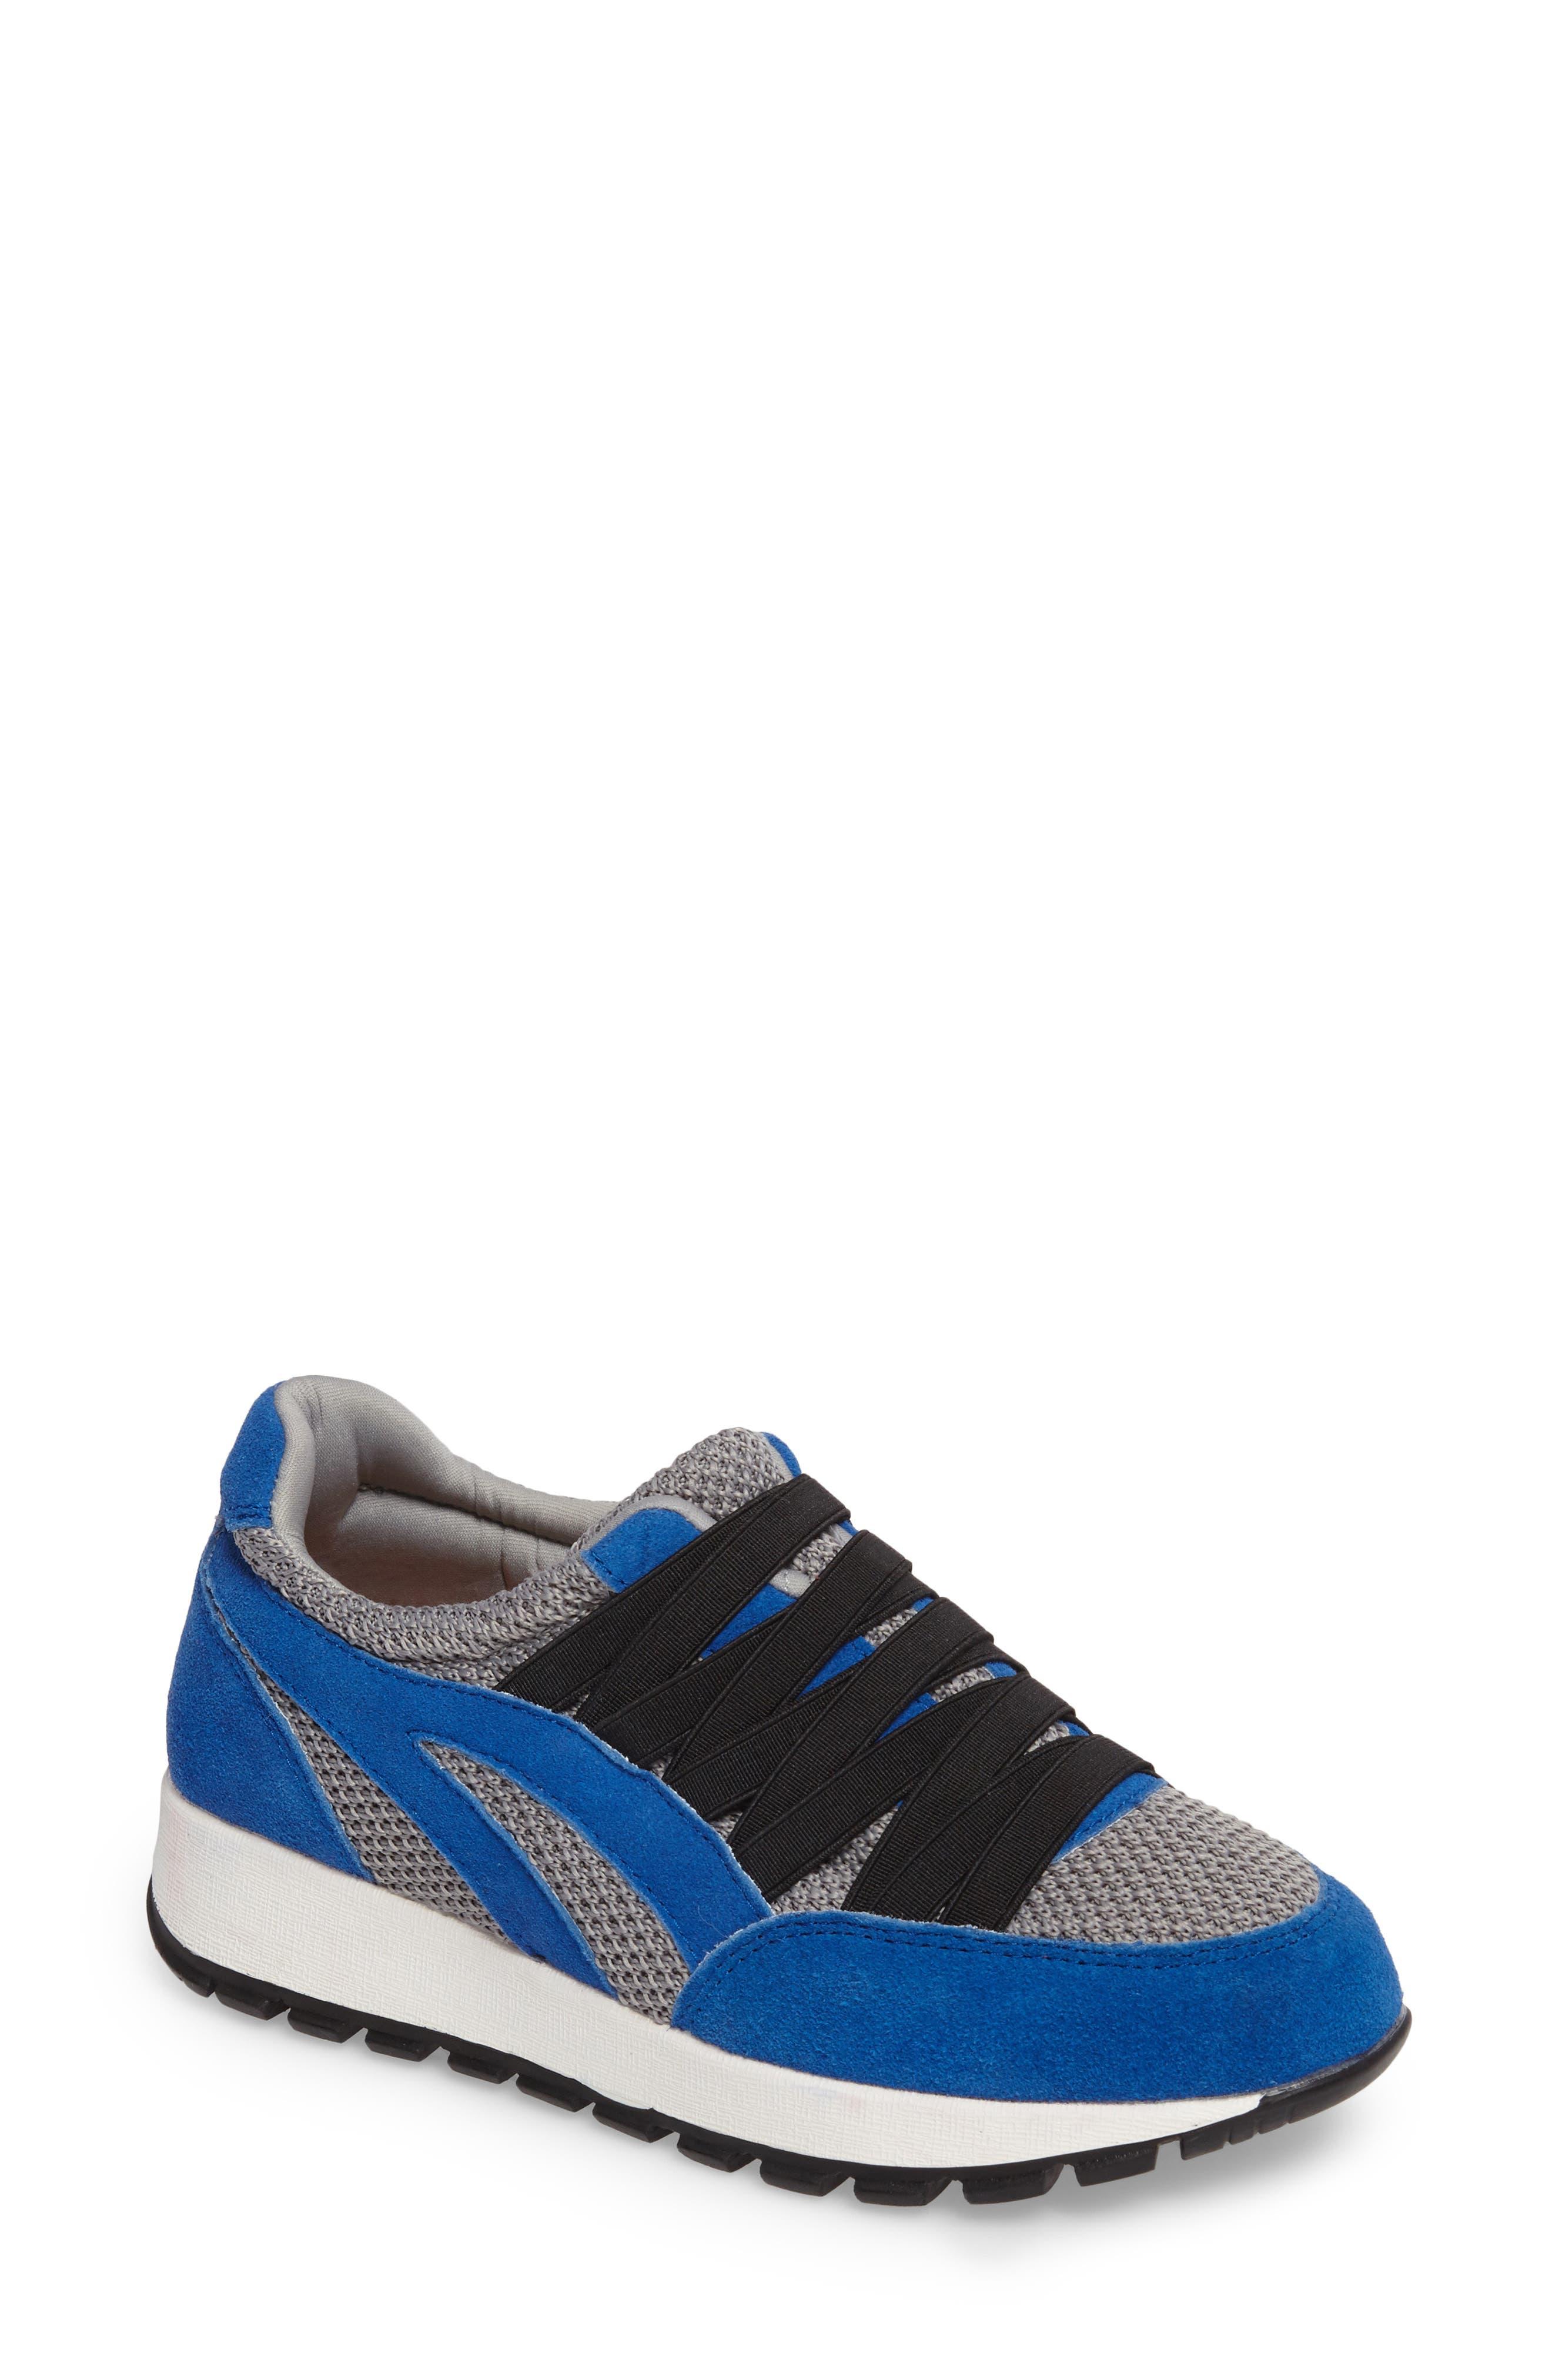 Bernie Mev Tara Cano Sneaker, Blue